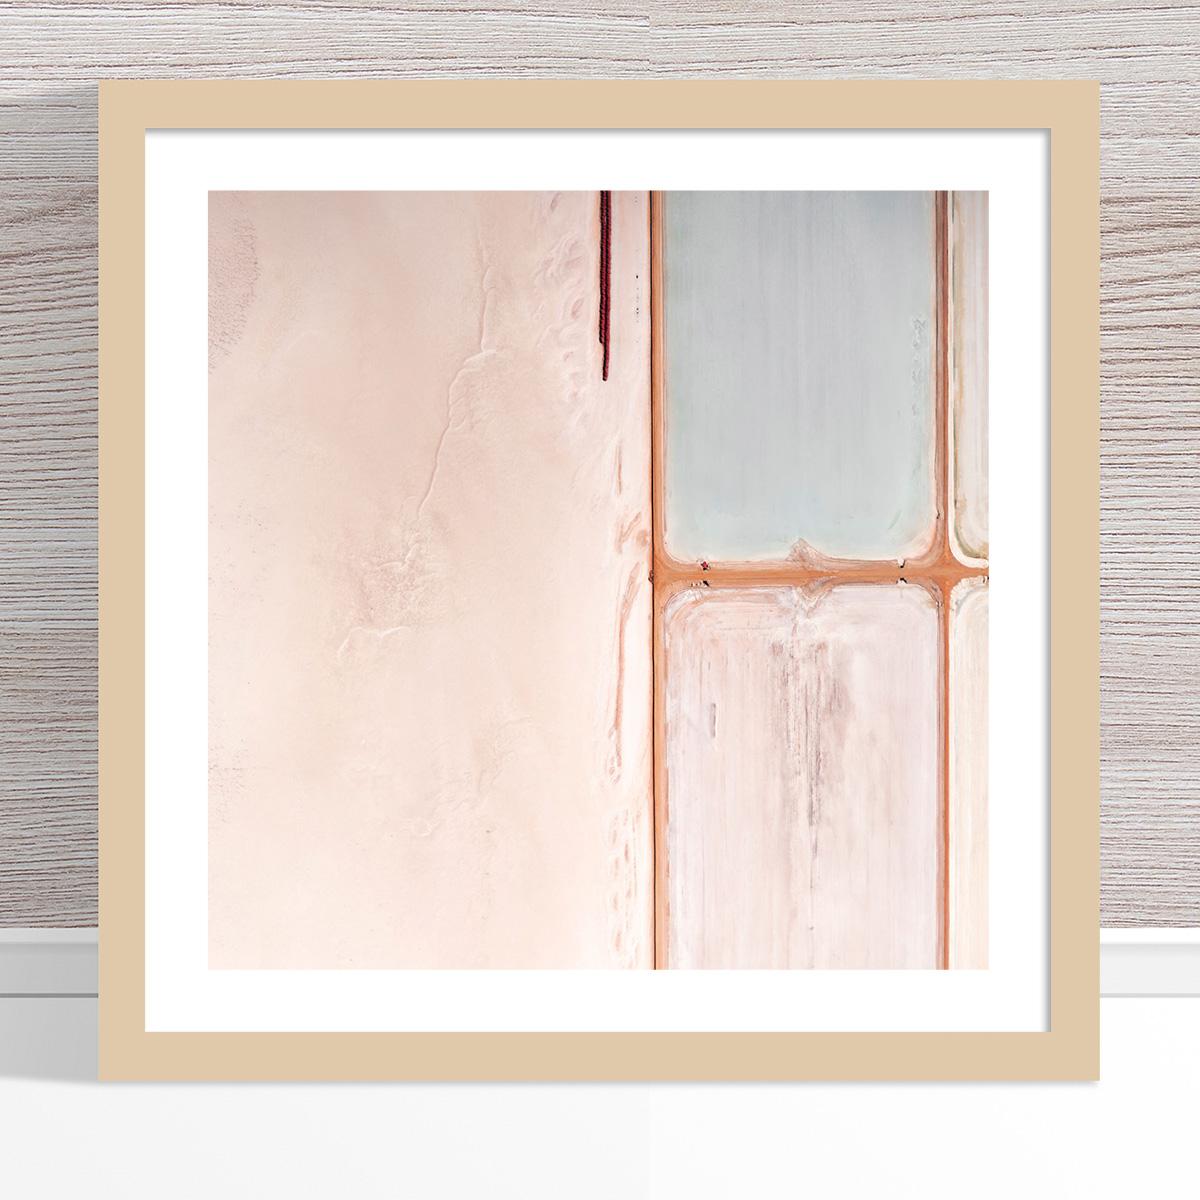 Chris Saunders - 'Aerial Salt 019' Light Frame